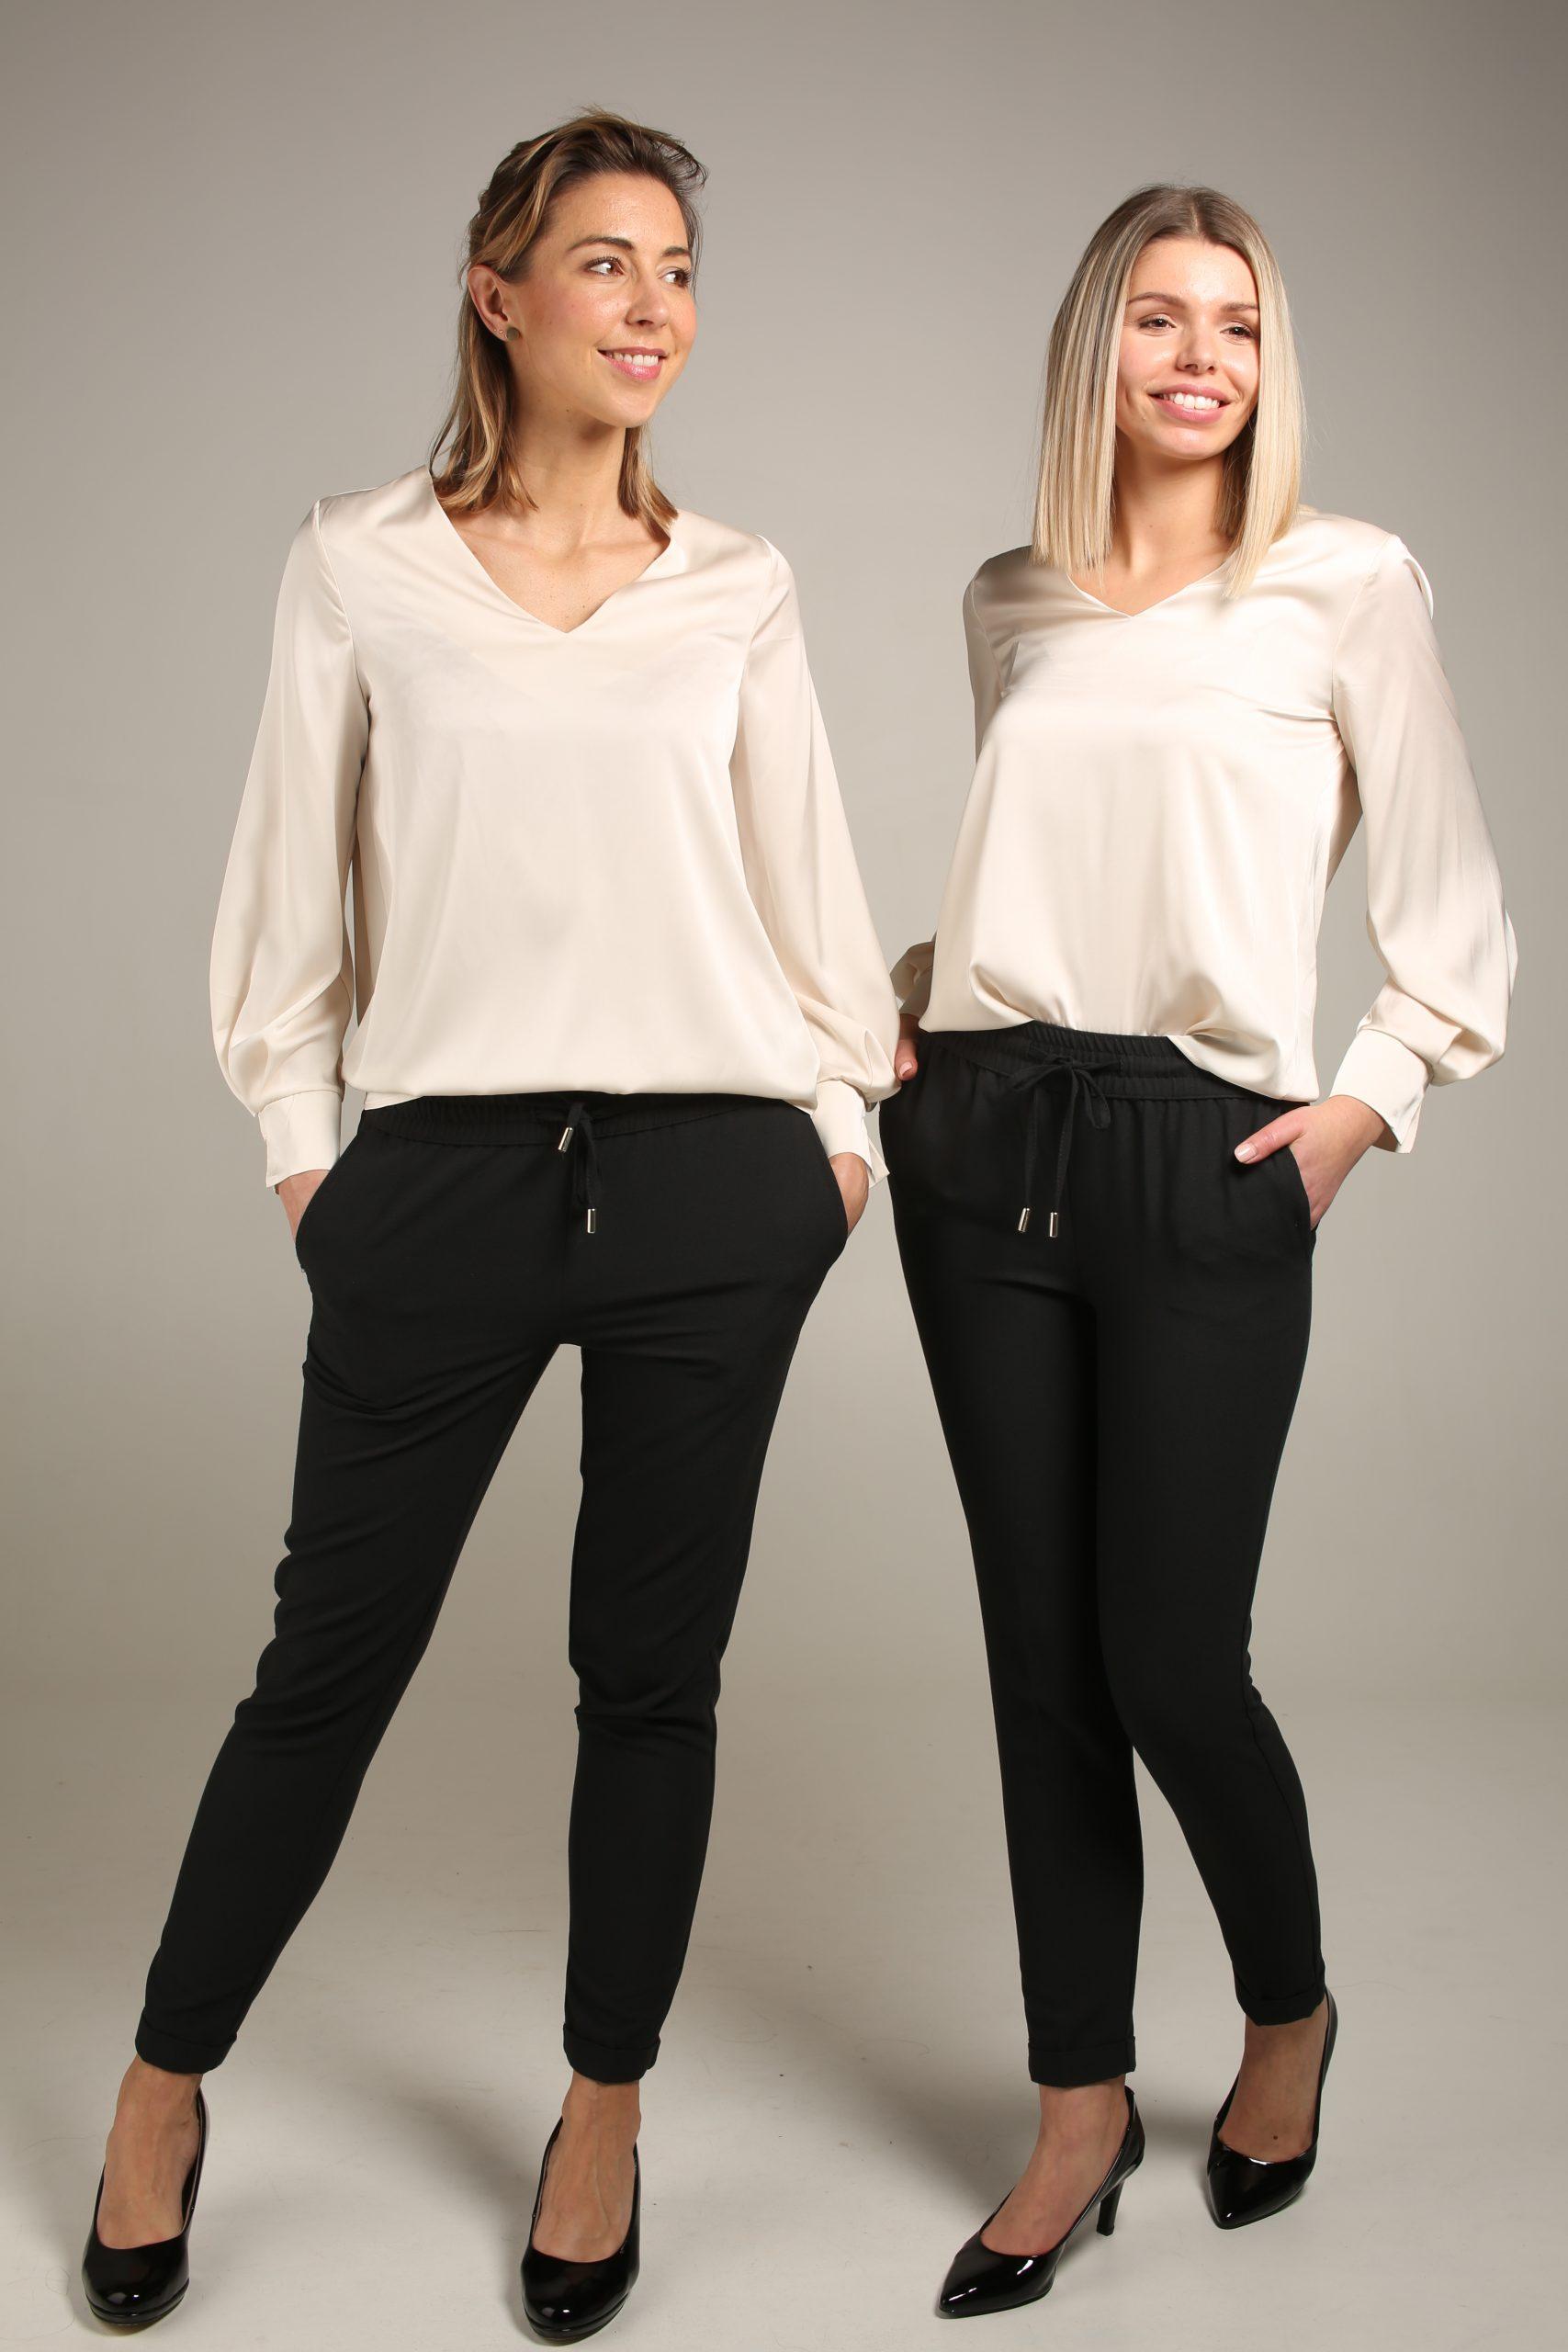 Zwarte broek & Crèmekleurige blouse